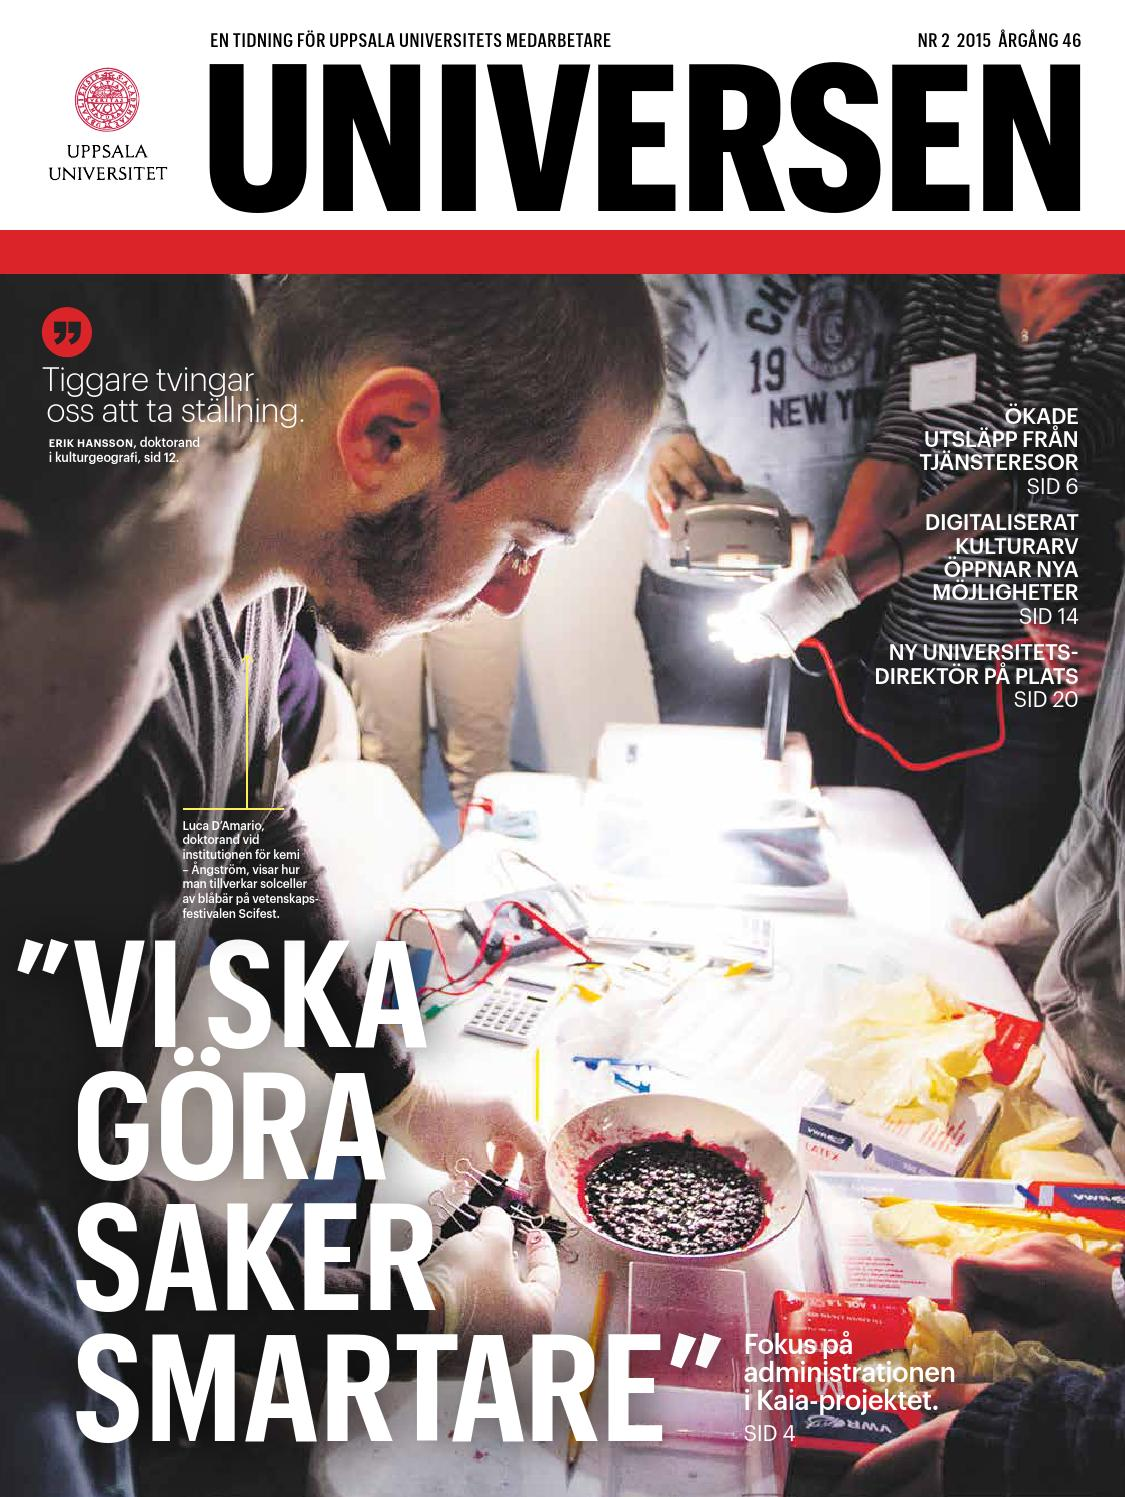 Tiggare Uppsala